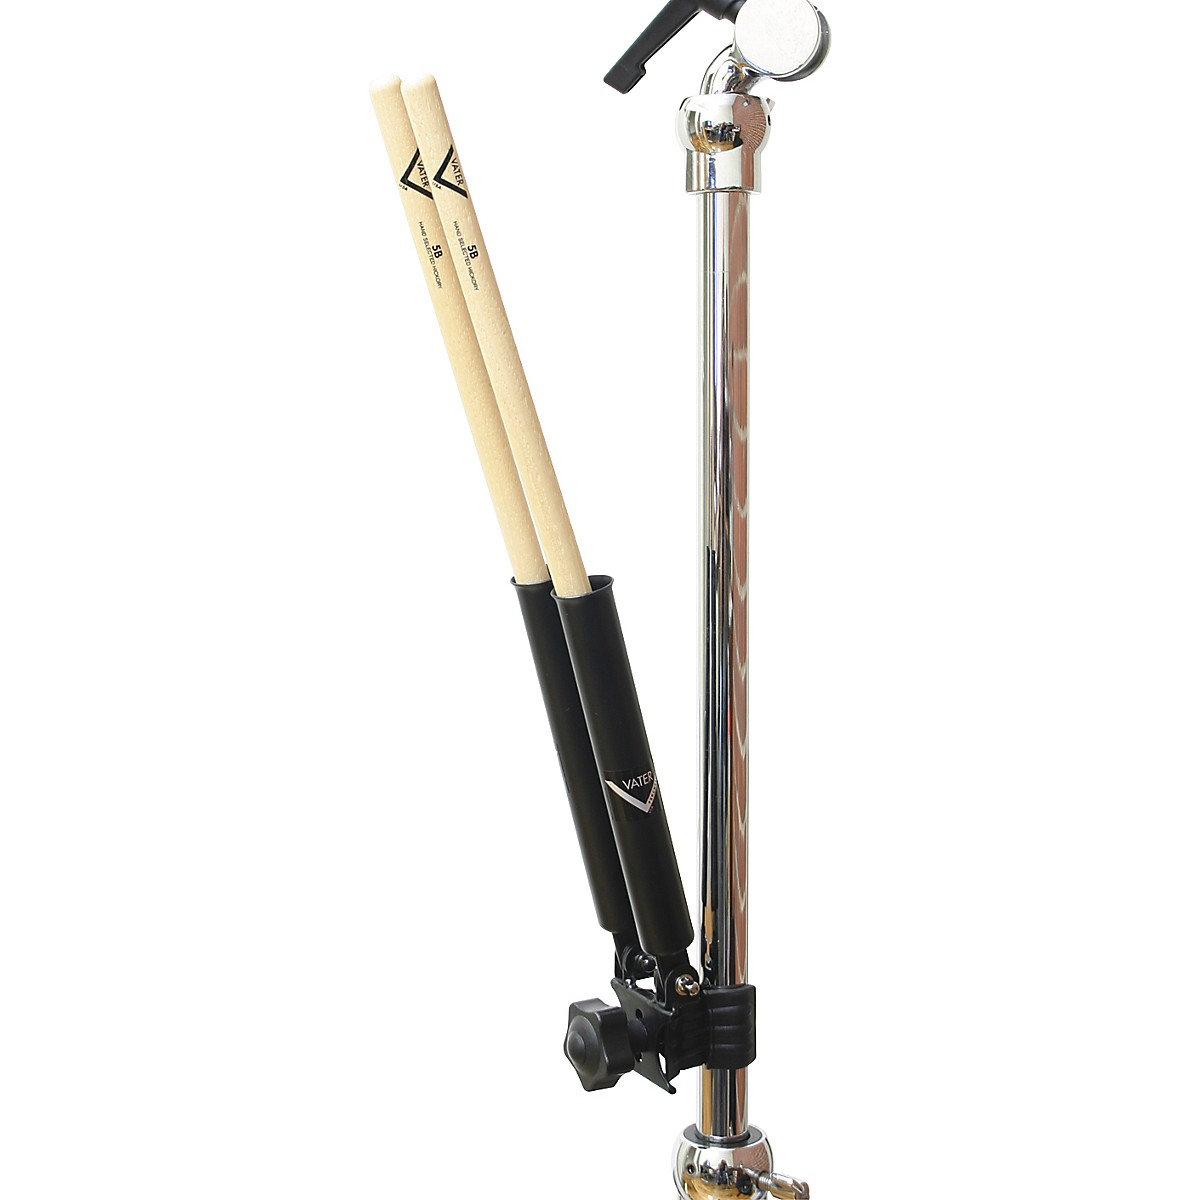 Vater Single-Pair Drum Stick Holder